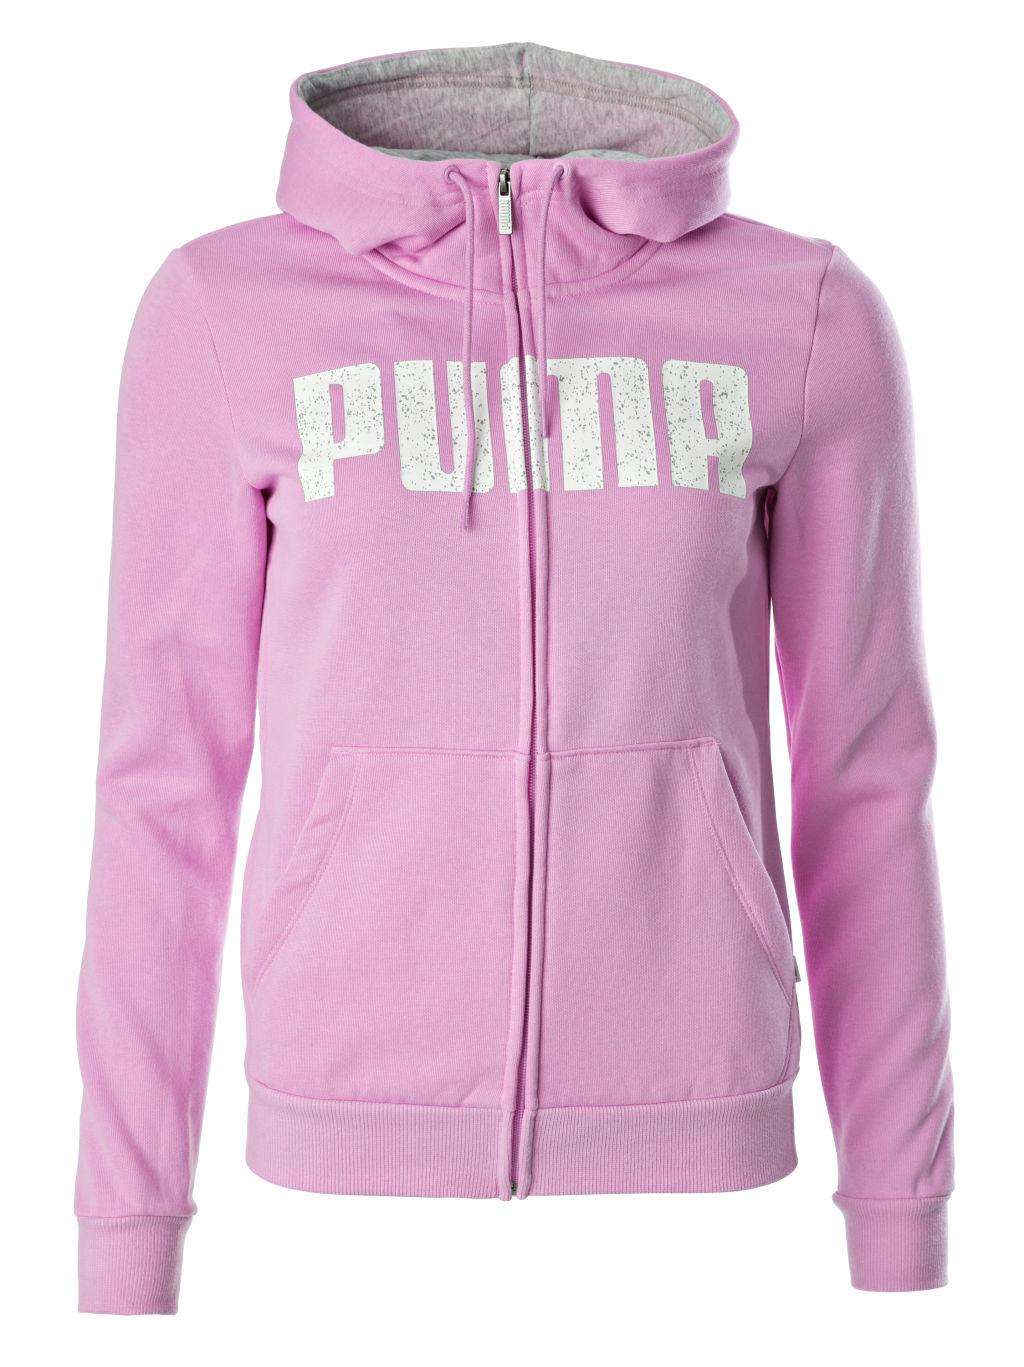 Puma Ka Graphic naisten collegetakki Vaaleanpunainen 19c426343d